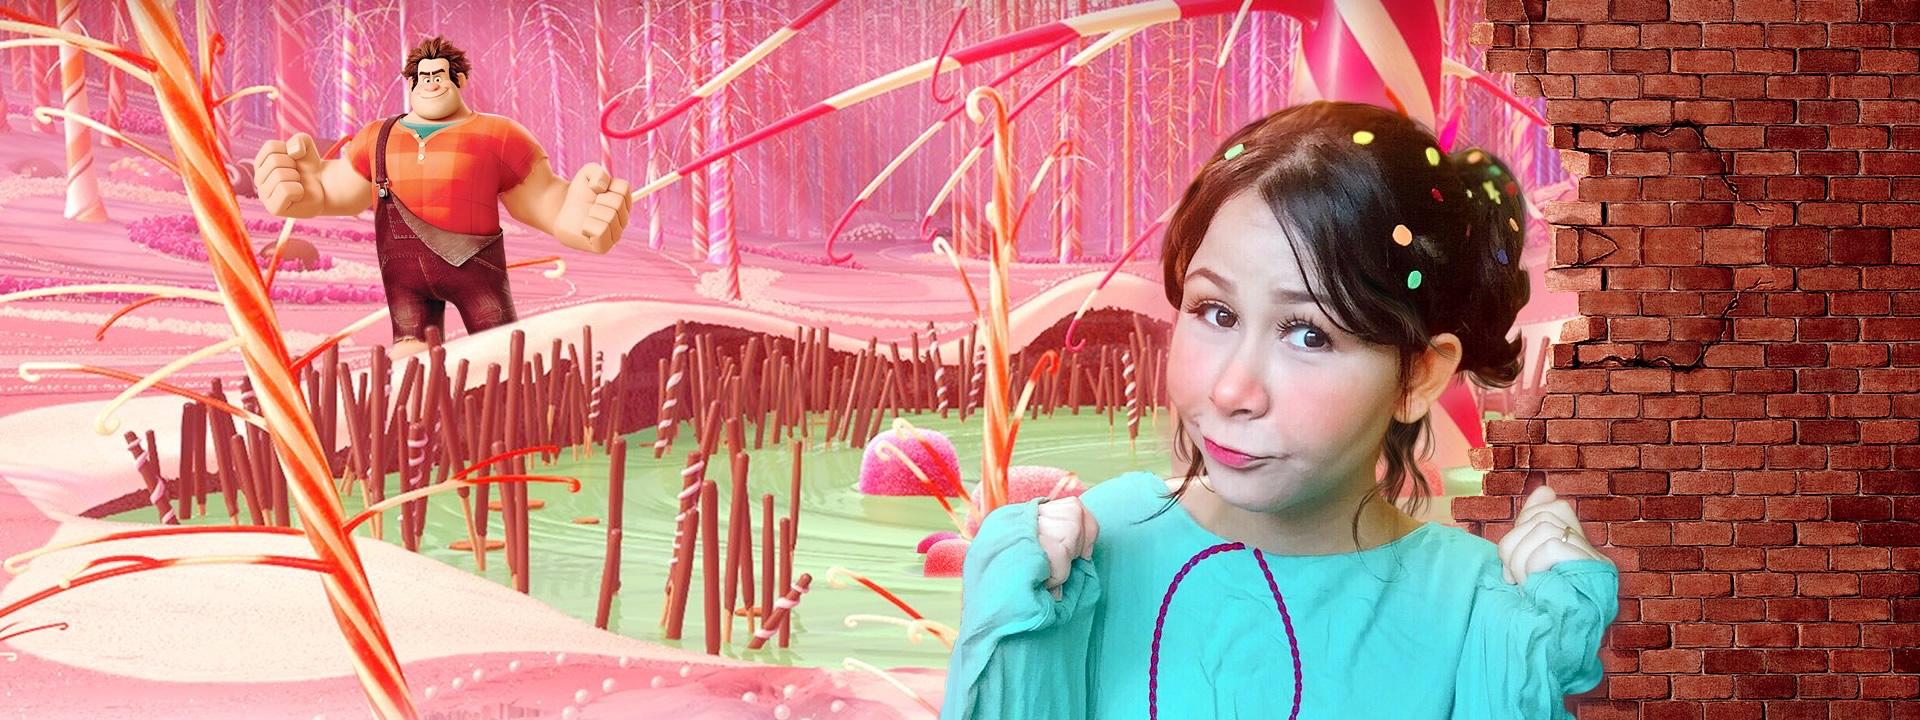 mayu cosplay venelope detona ralph - Mayu Cosplay